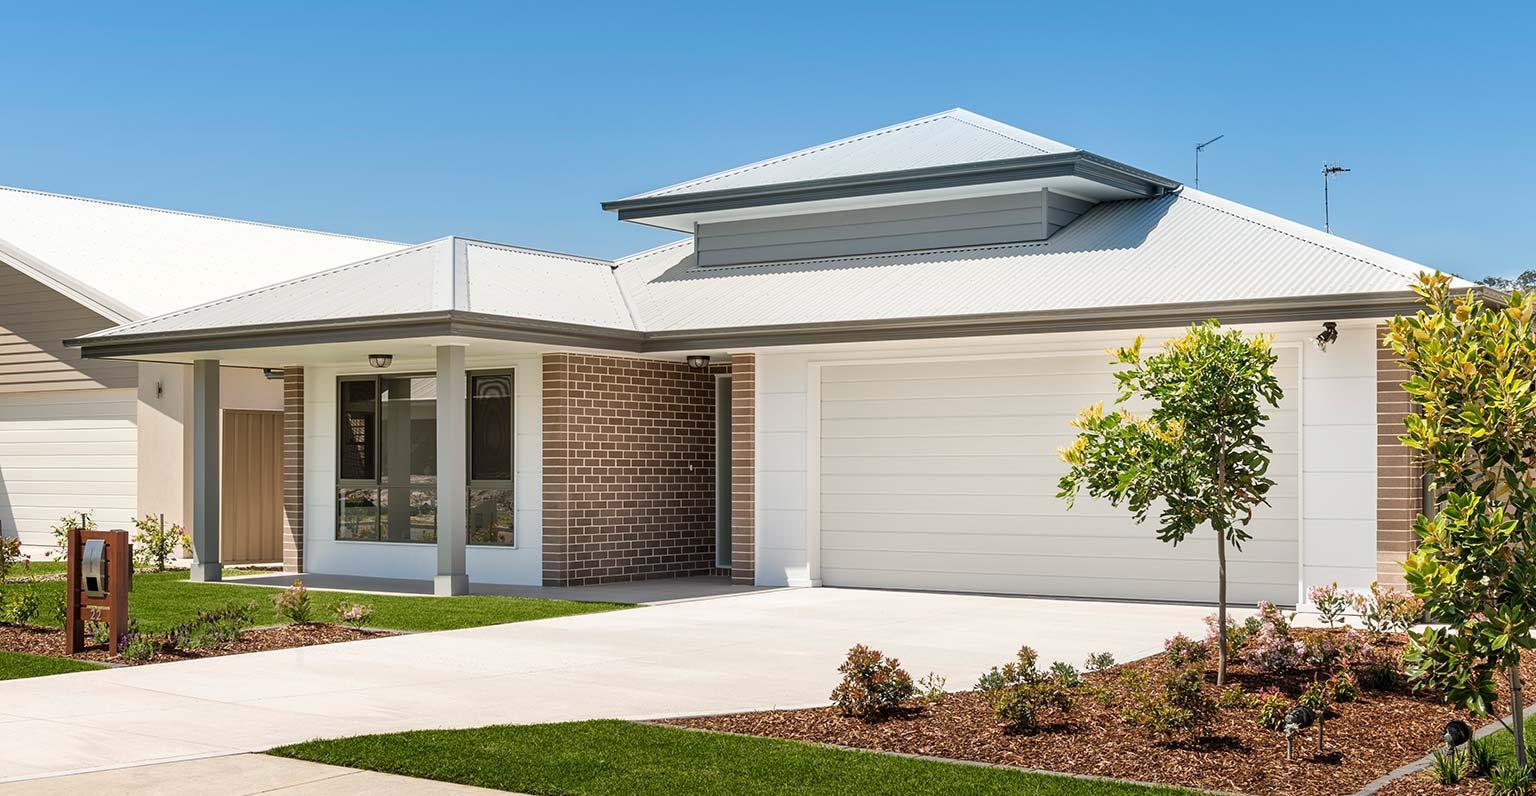 Vantage Estate, Corlette NSW, built by MJH Multi